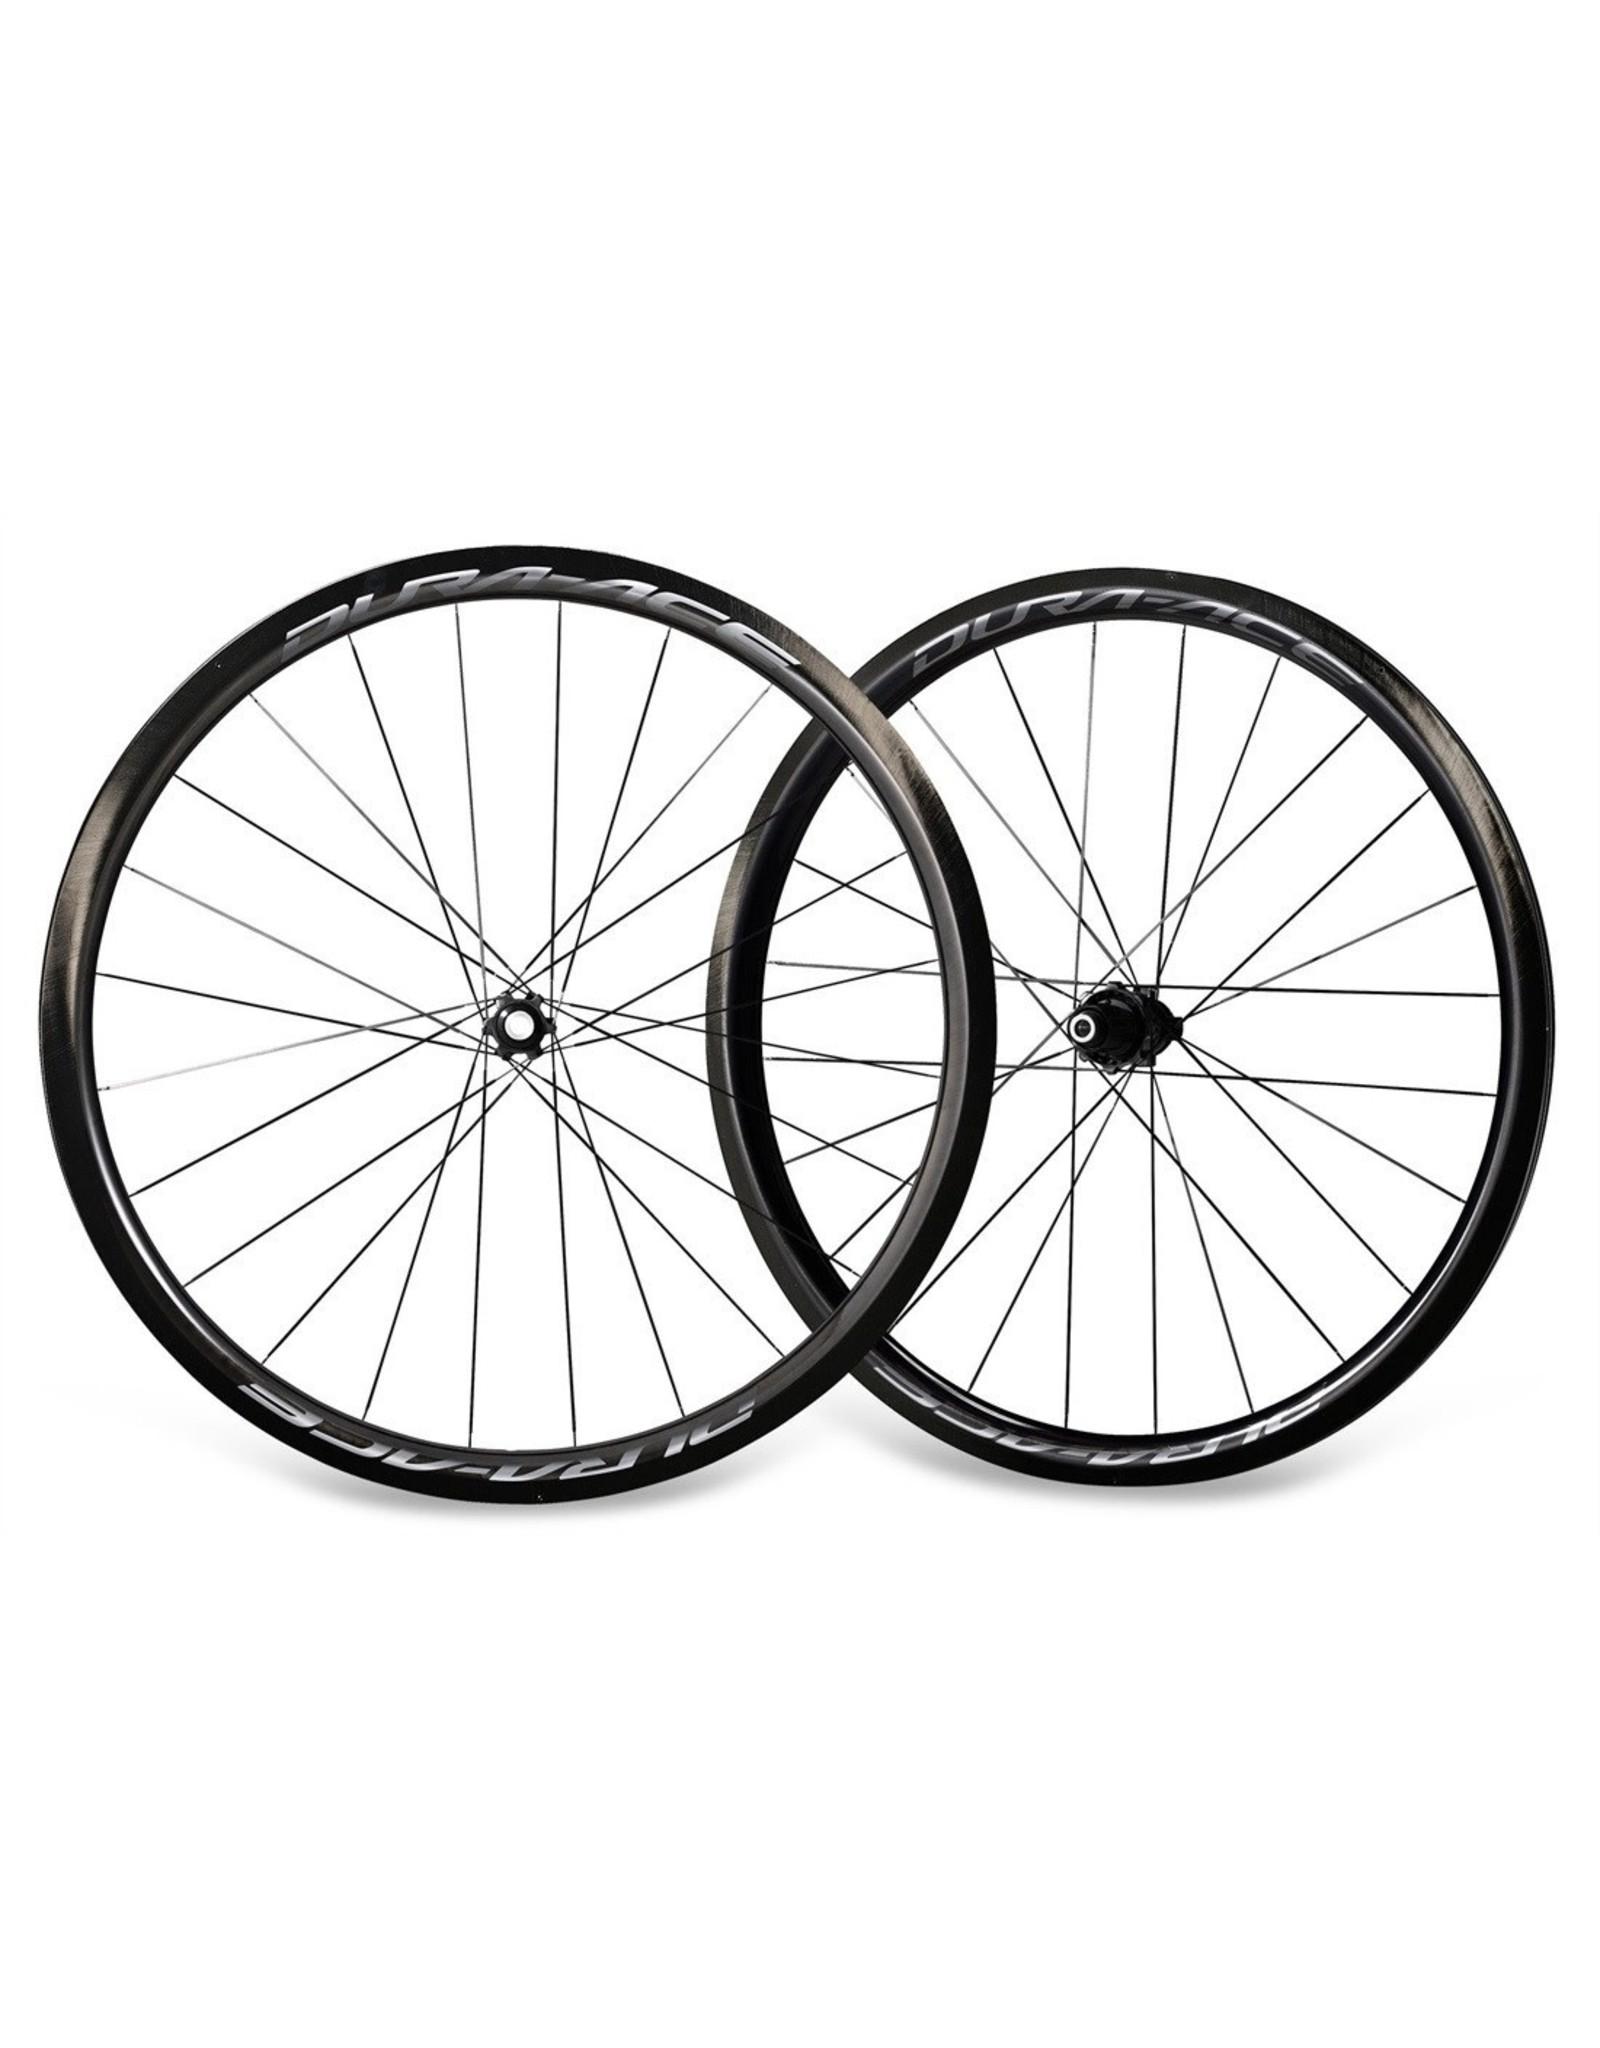 Shimano Shimano Dura-Ace WH-R9170 C40 Disc Clincher Tubeless Wheelset -  (12x142mm/12x100mm)